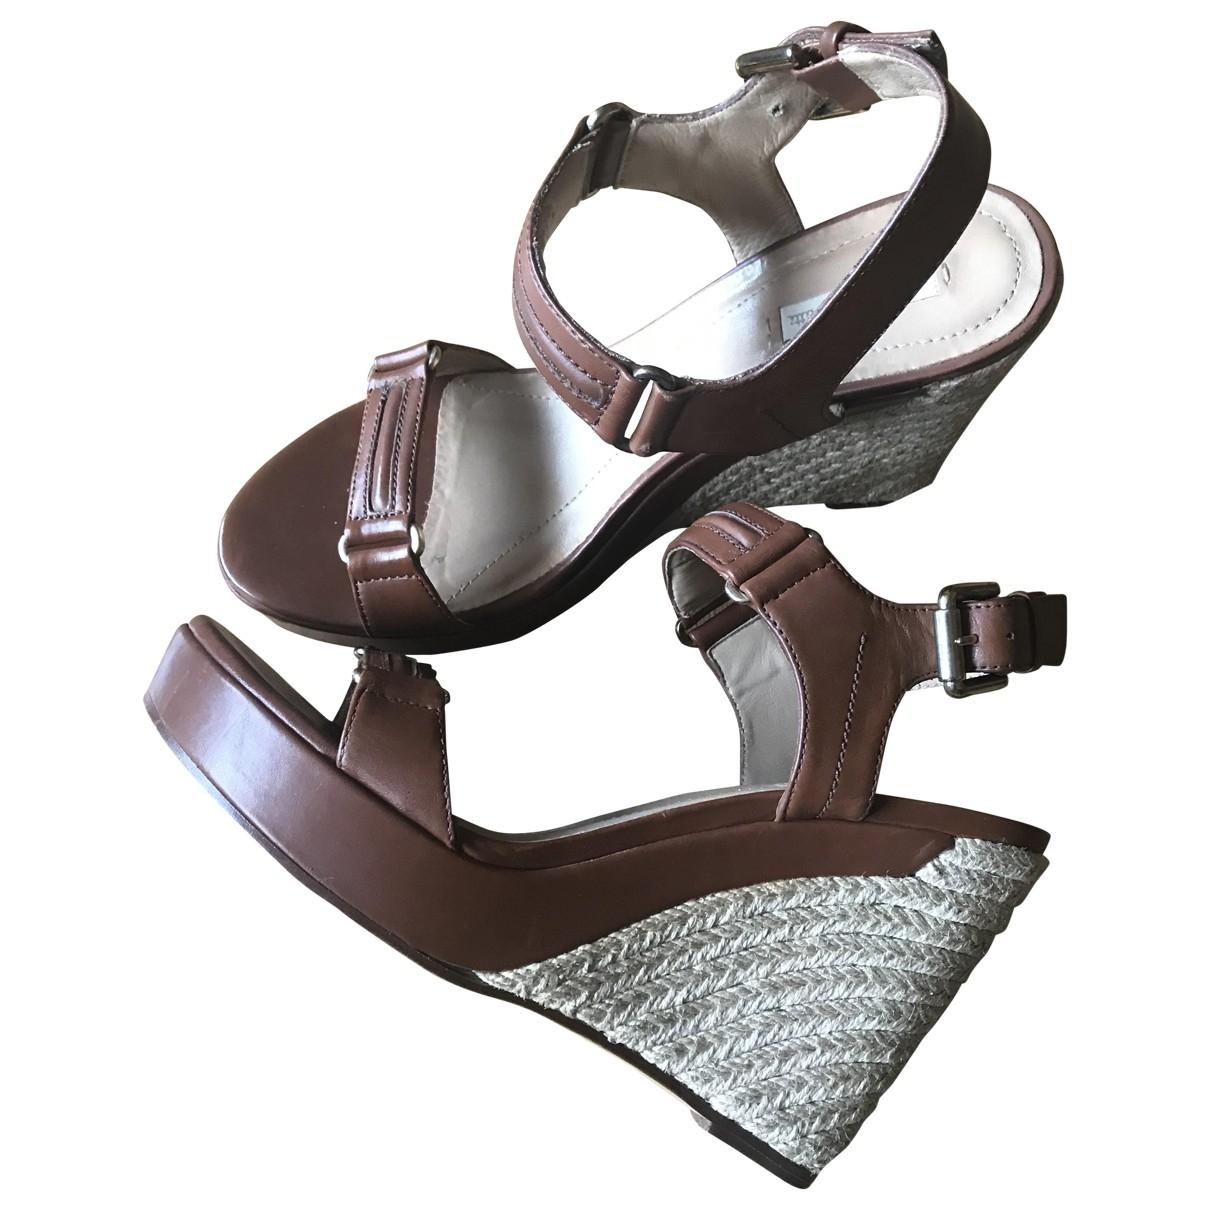 Sandalias de Cuero Massimo Dutti